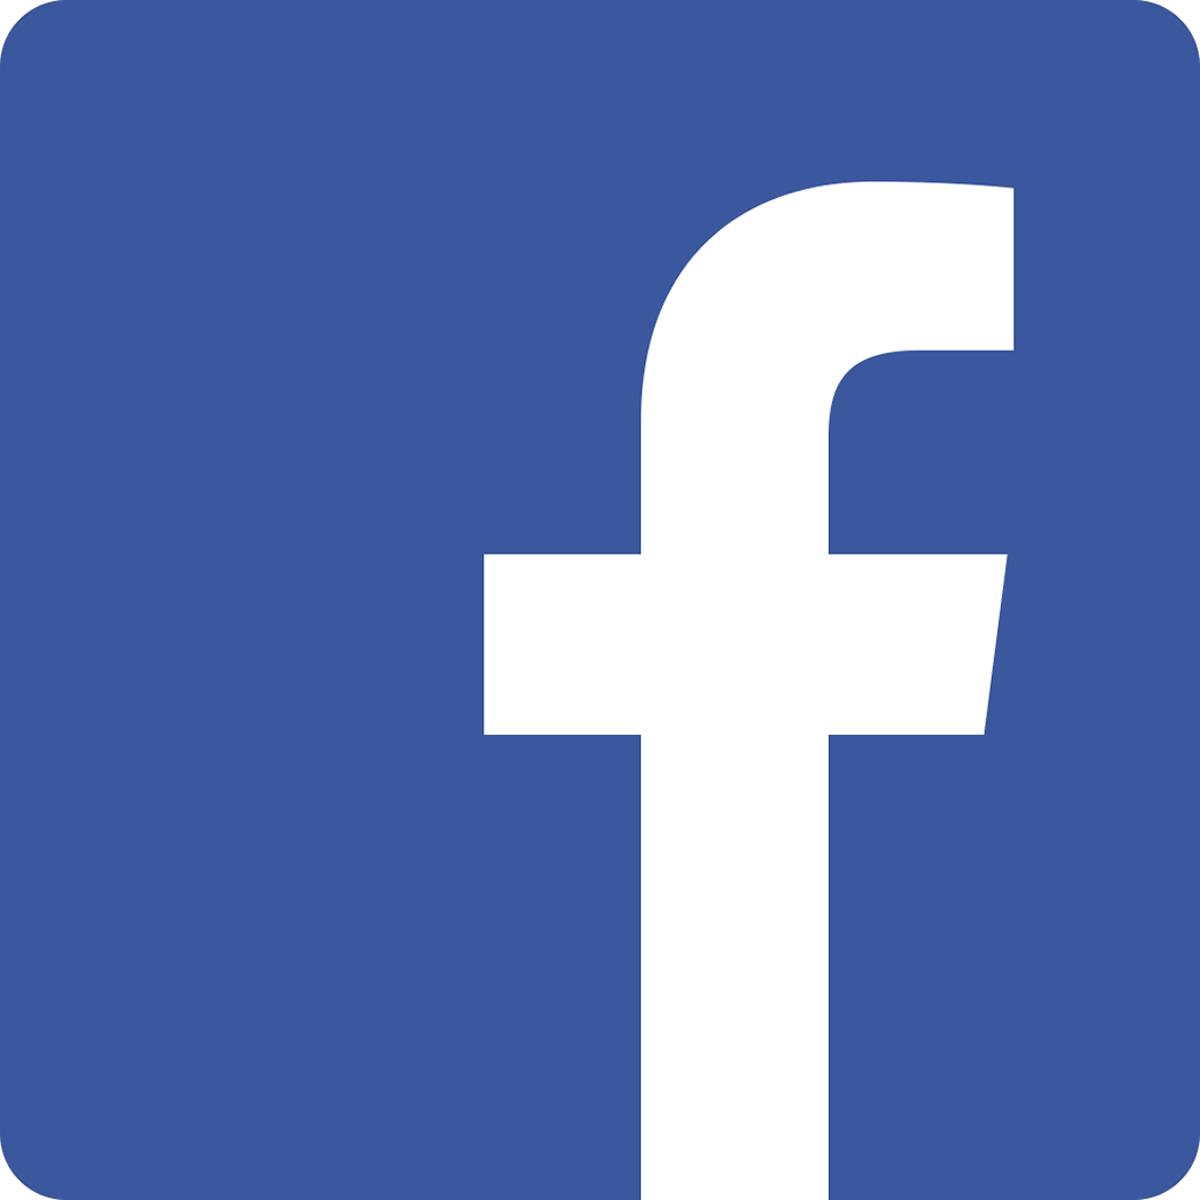 Facebook Logo - Copy